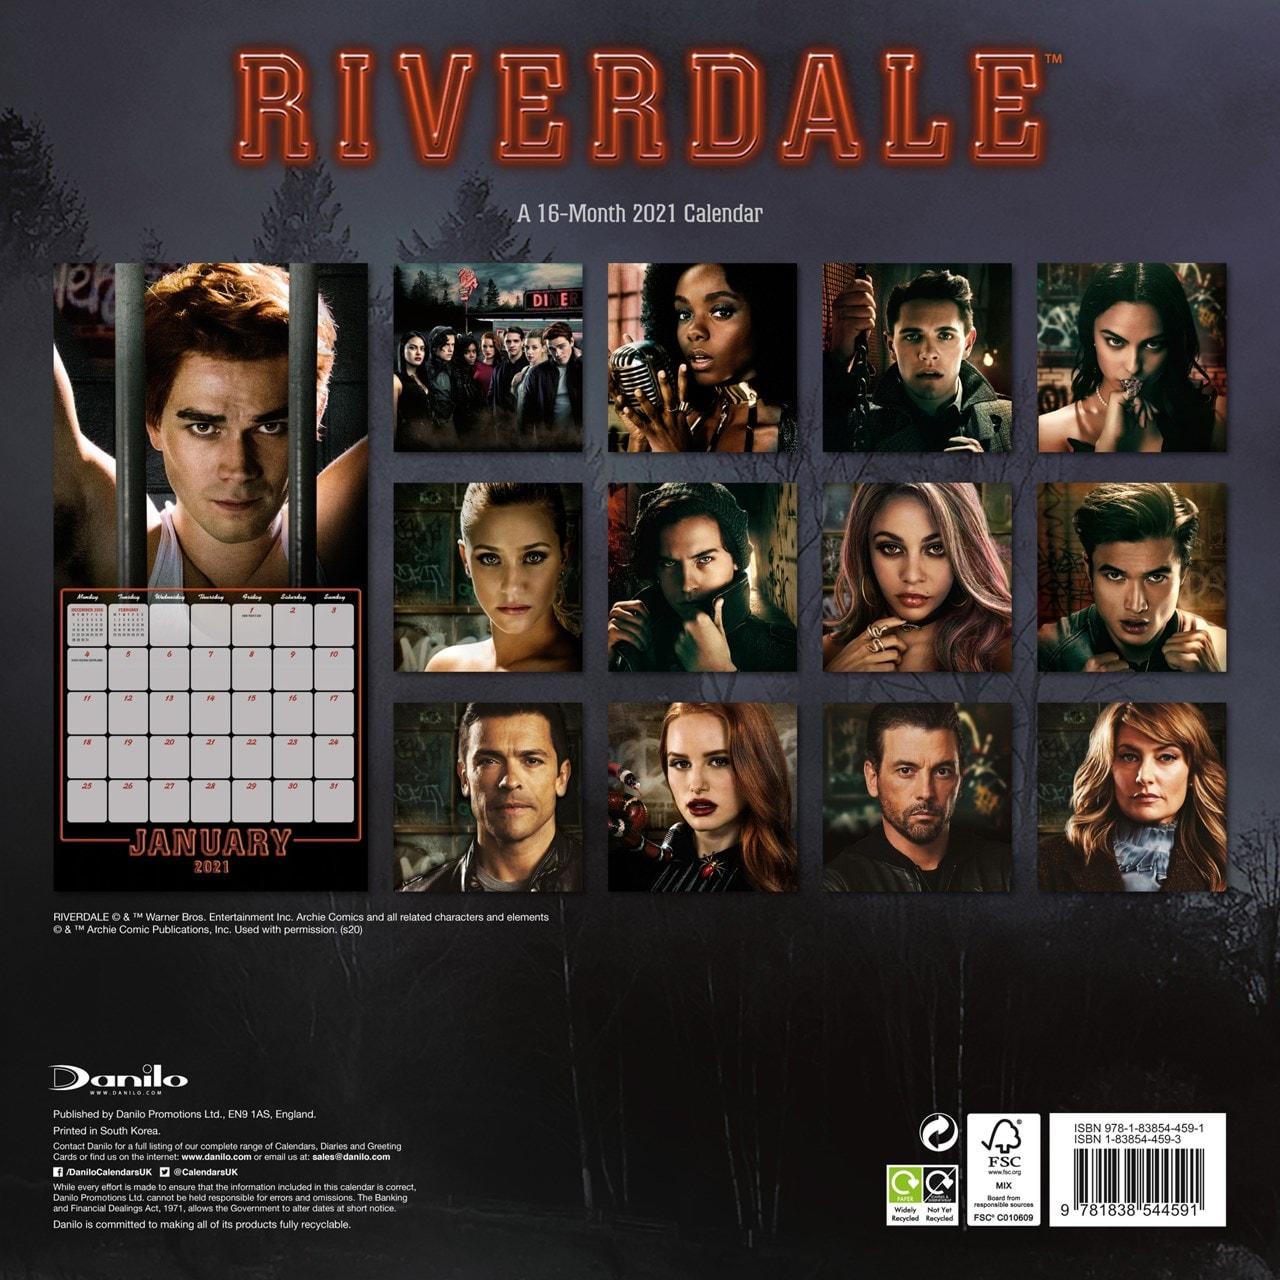 Riverdale: Square 2021 Calendar - 3